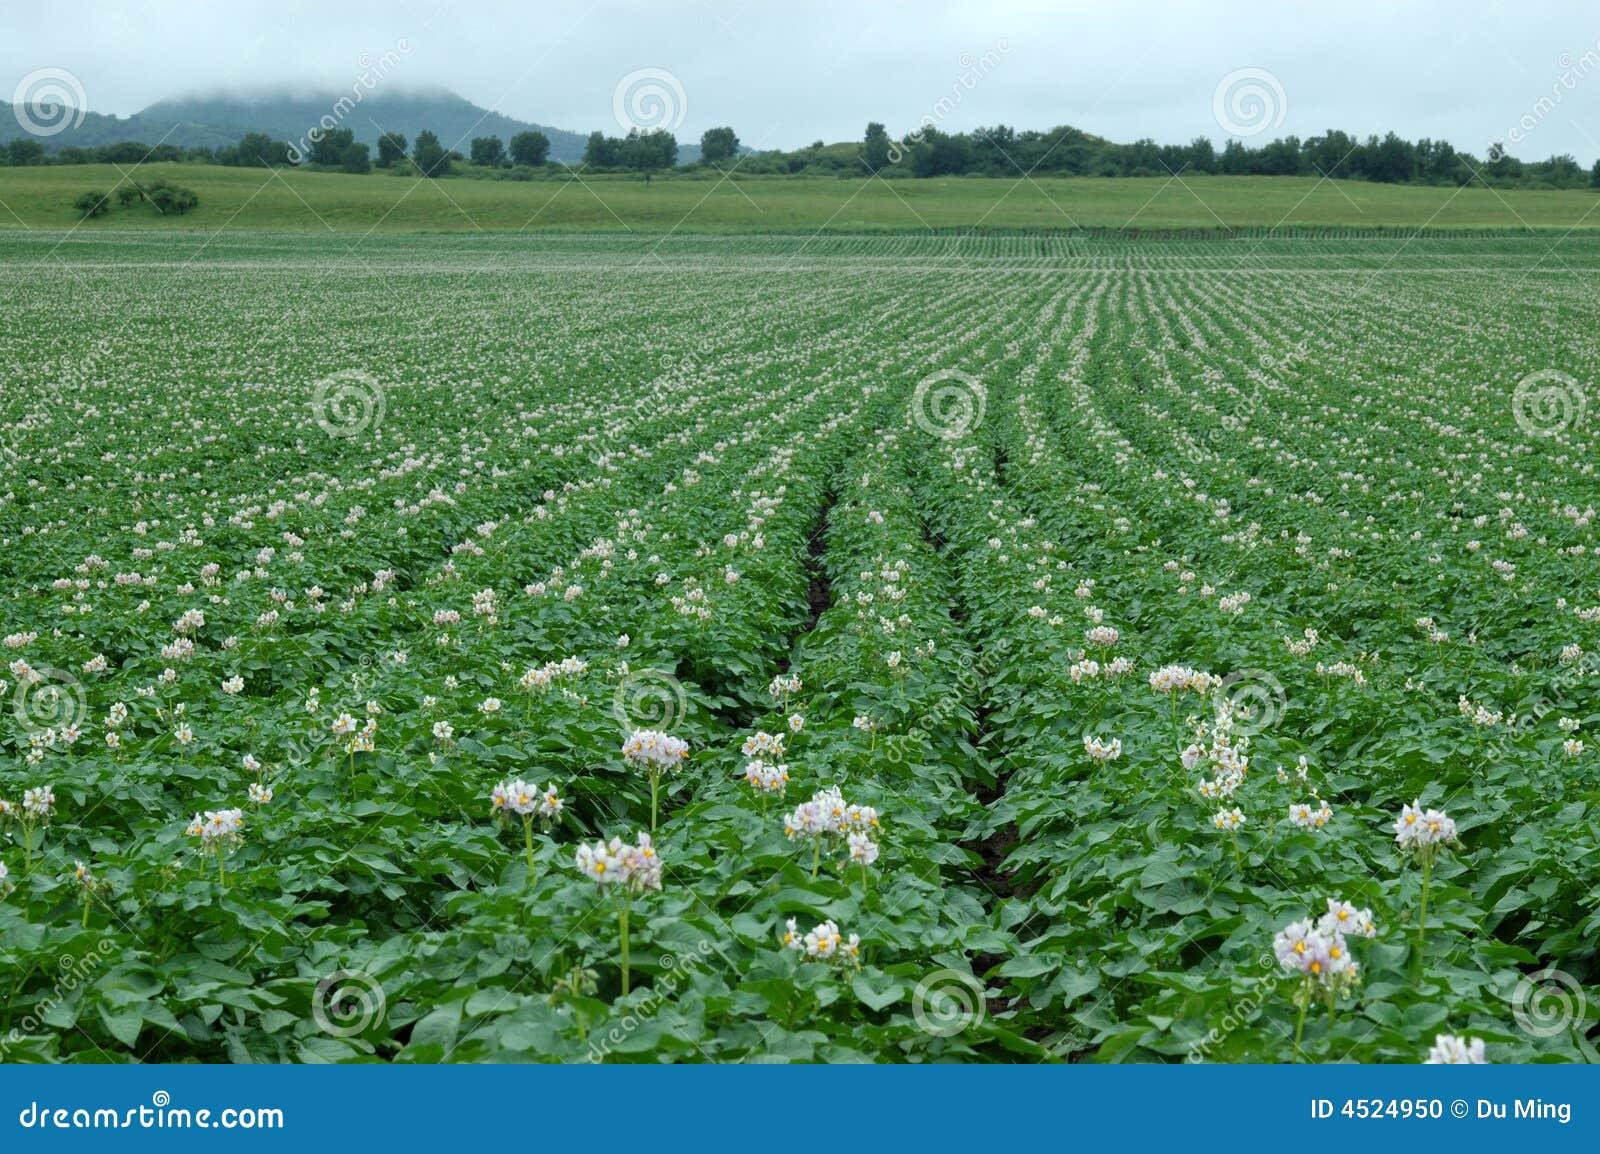 Potato Flower Stock Photo - Image: 4524950